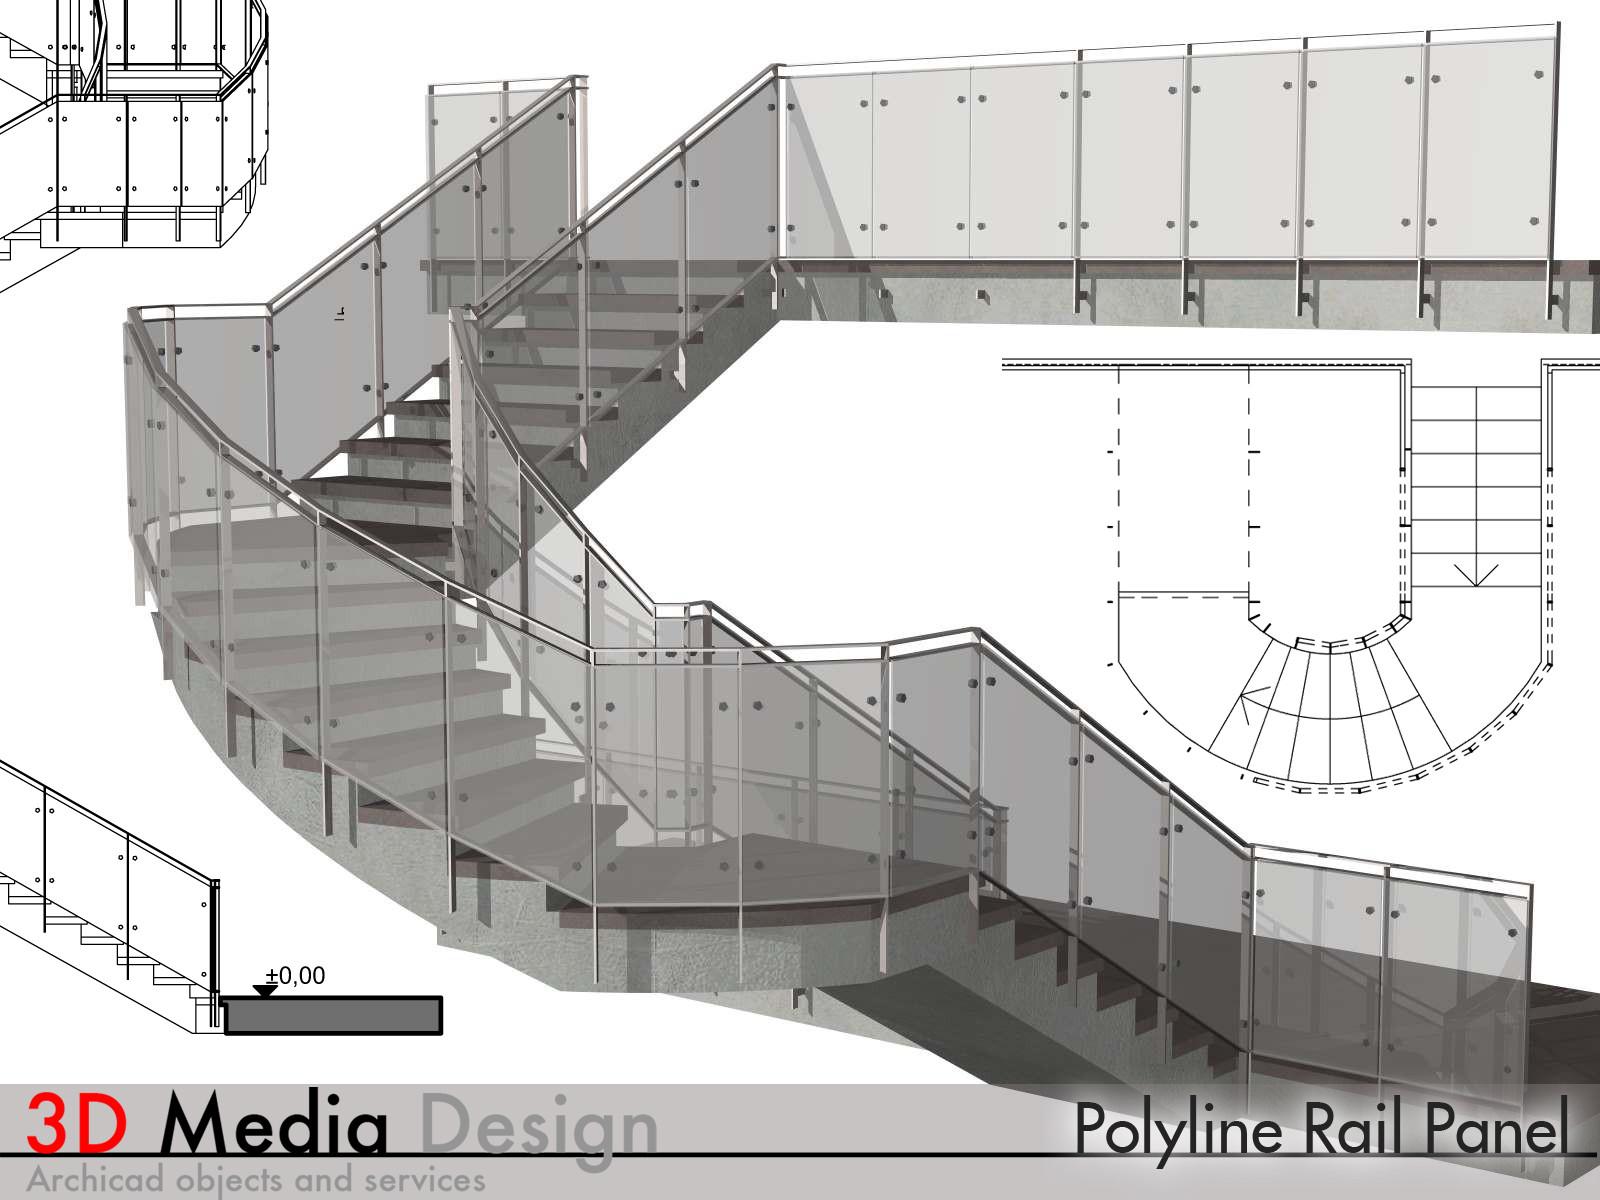 3DMD Polyline Rail Panel - Main.jpg